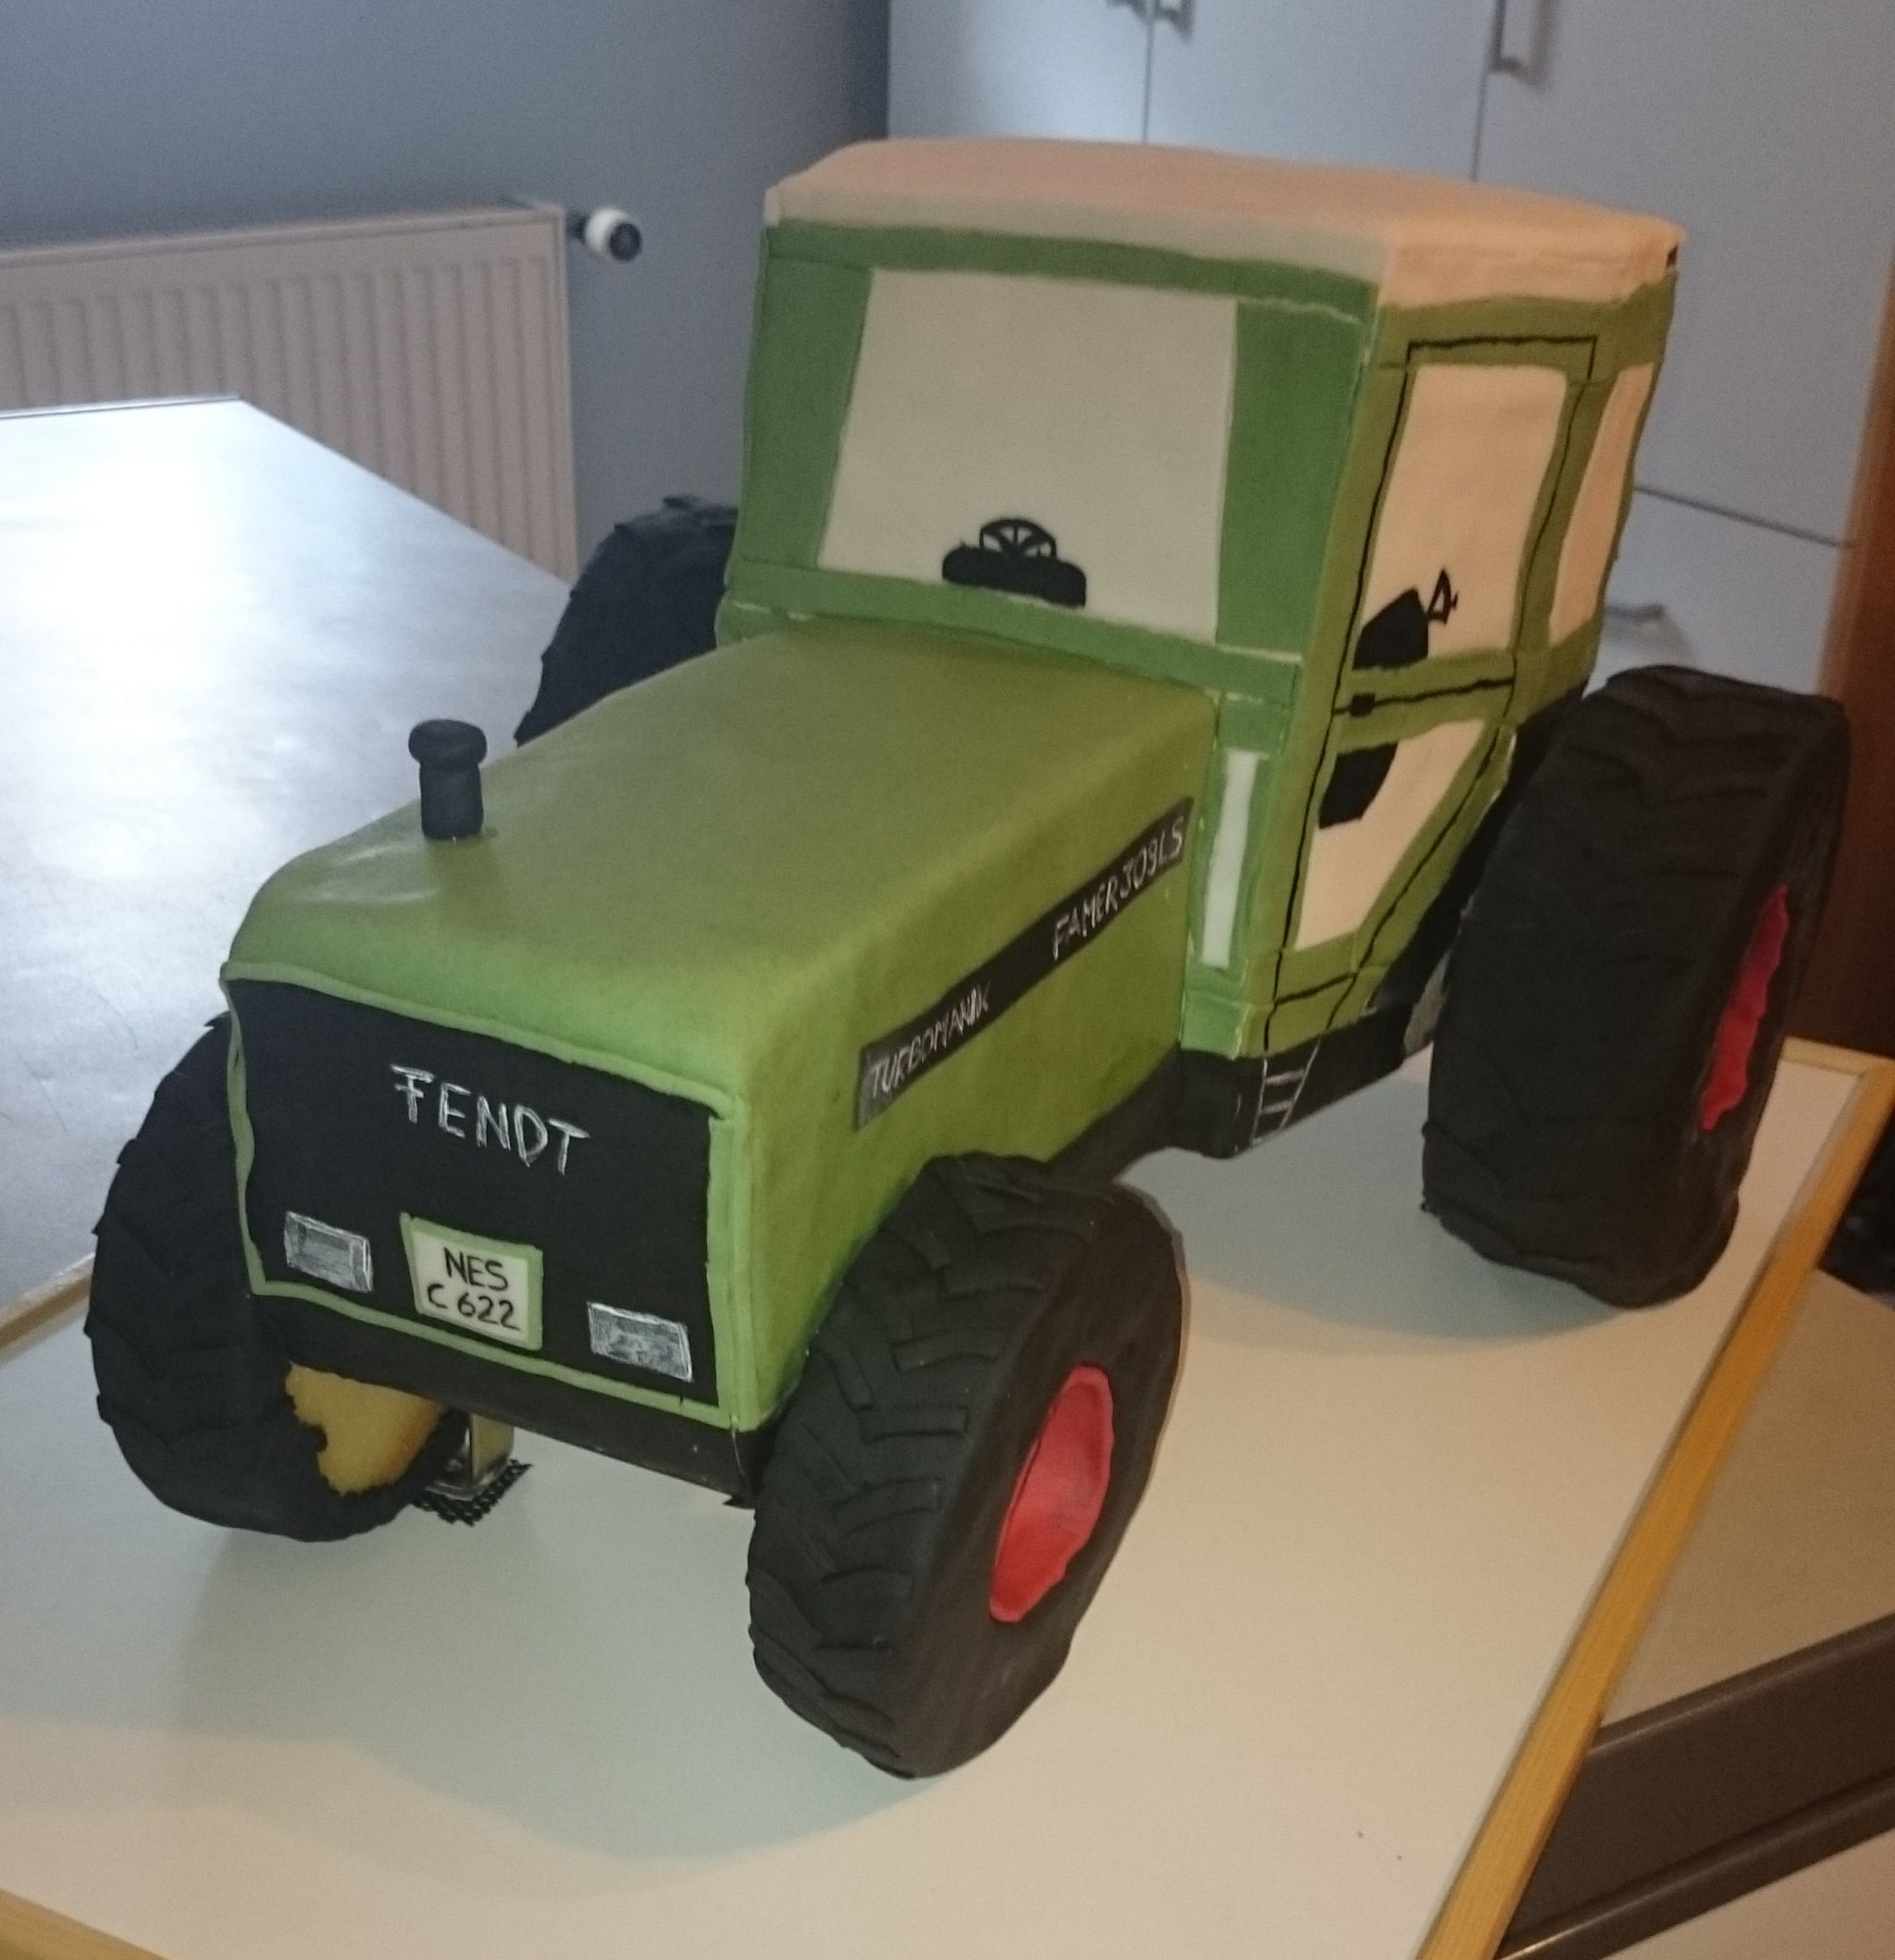 3d Traktor Torte Traktor Torte Traktor Traktor Geburtstagskuchen